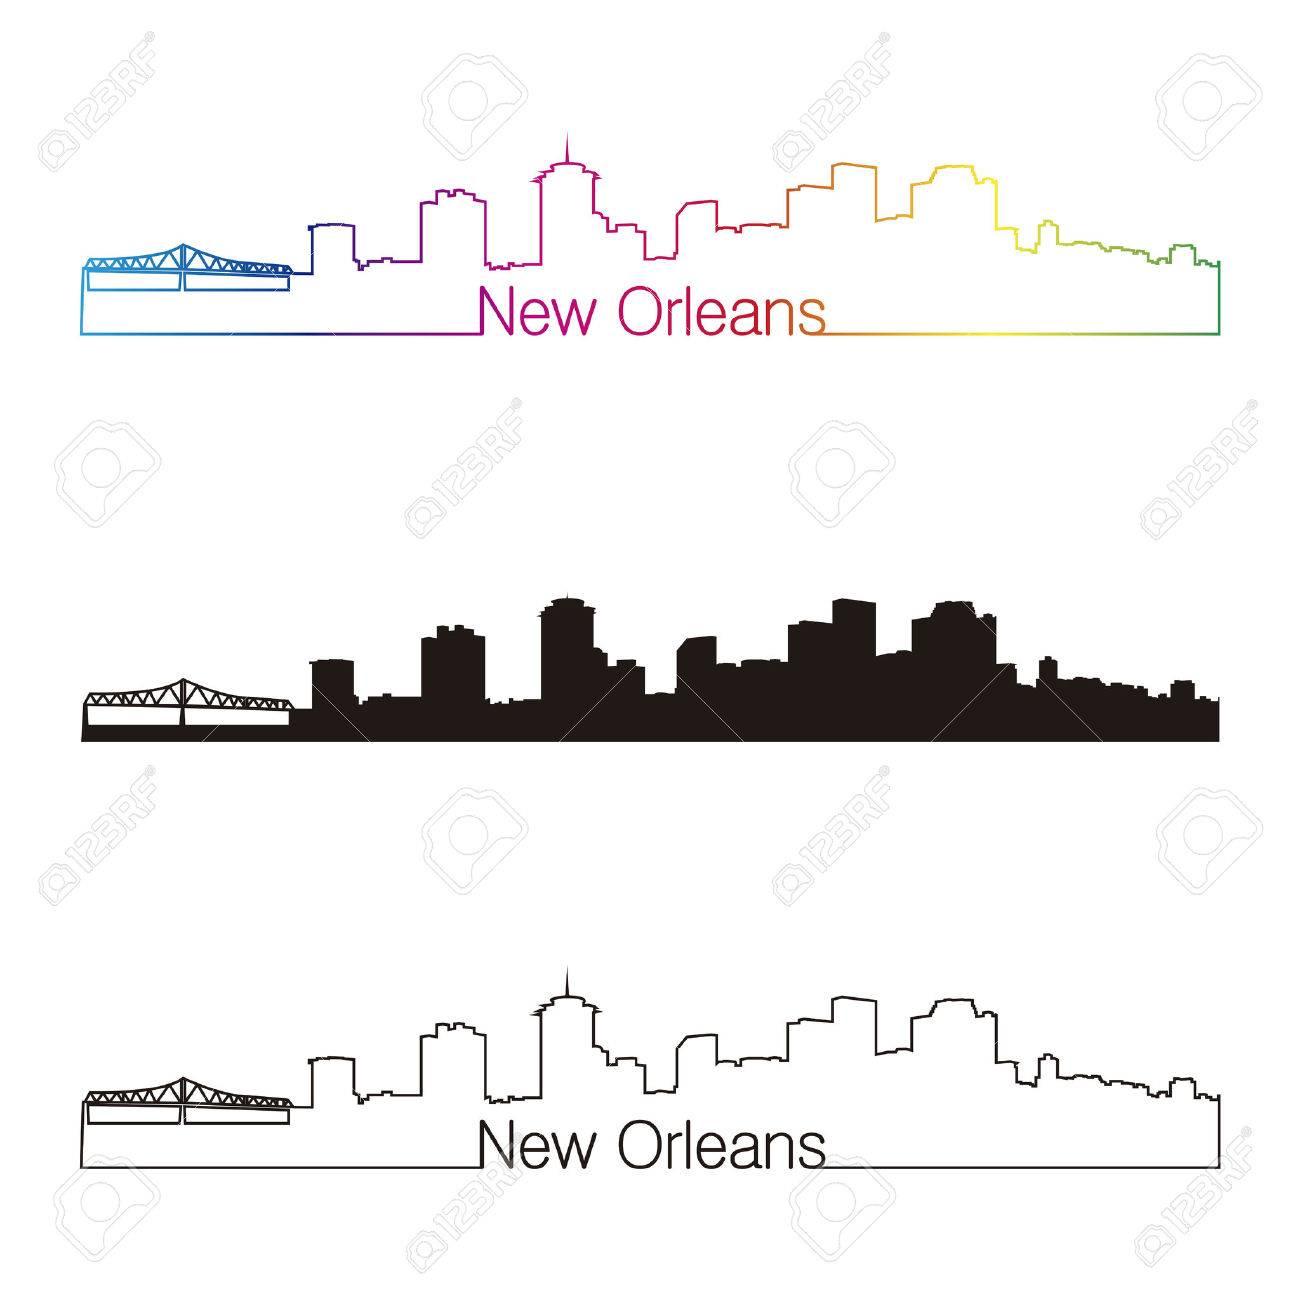 New Orleans City Skyline New Orleans Skyline Linear